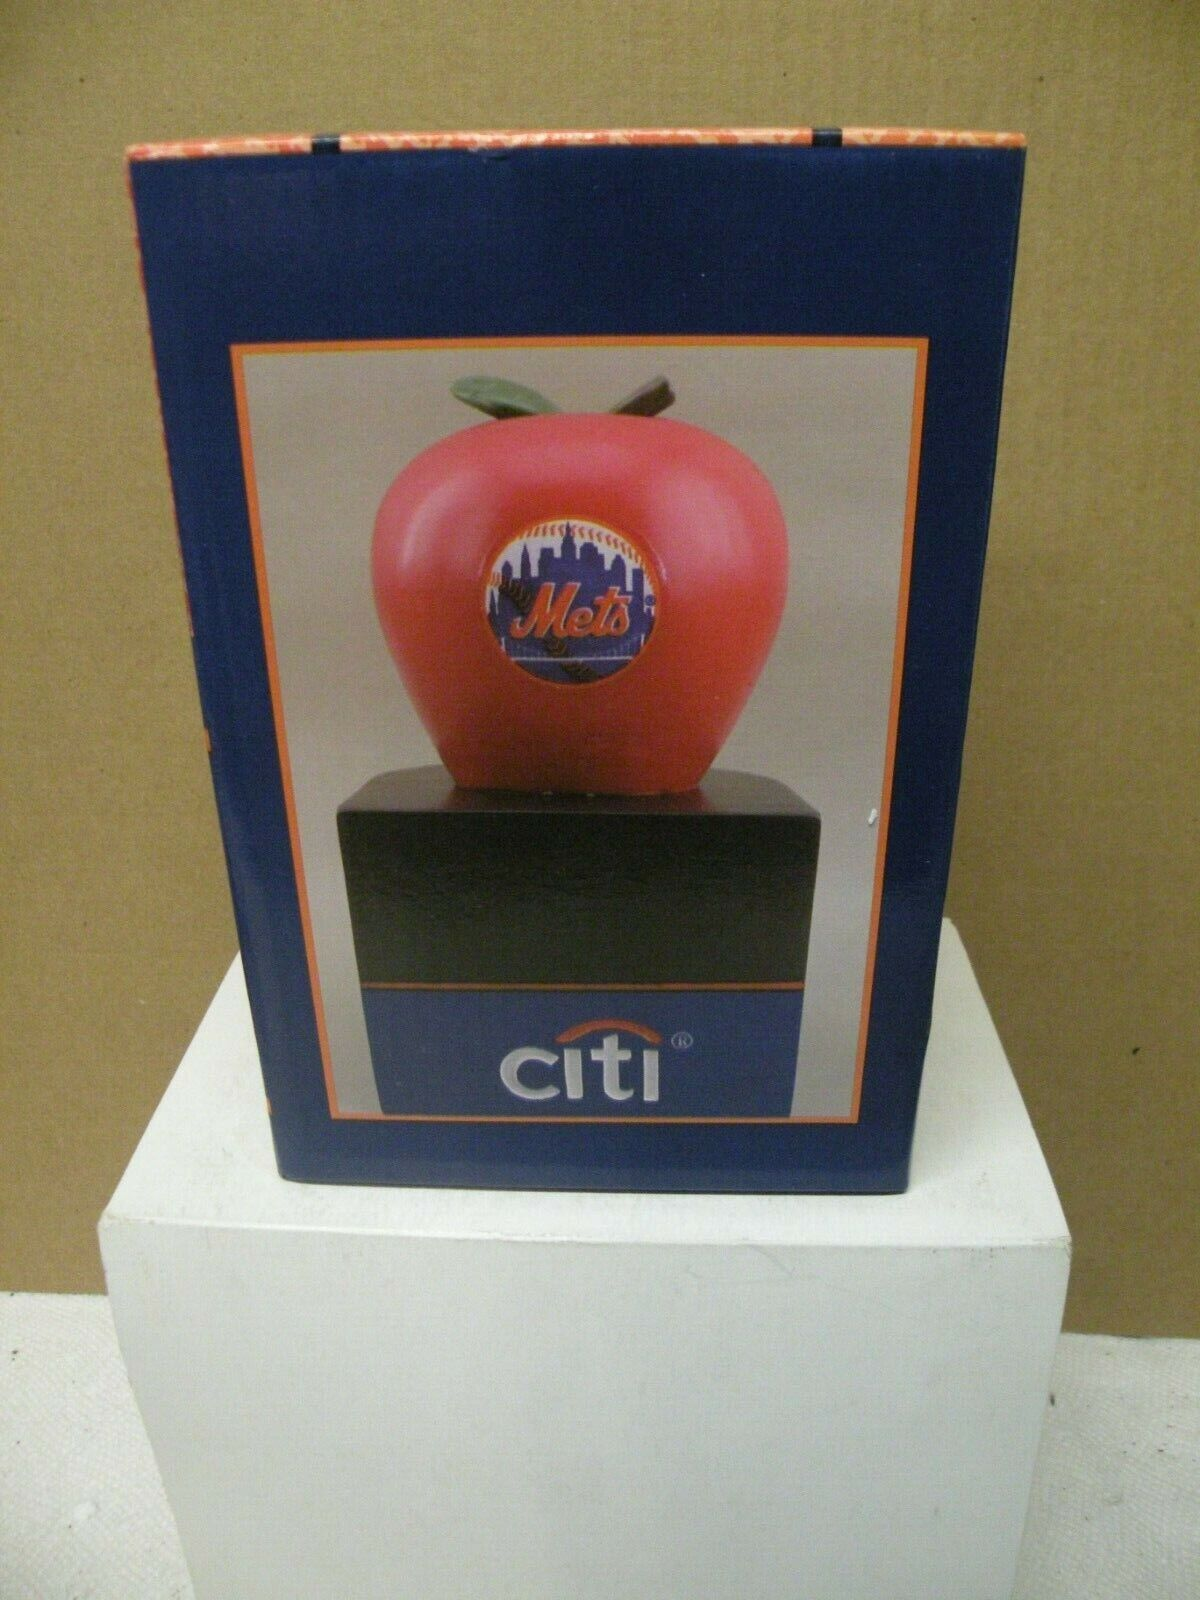 NEW YORK METS CITI HOME RUN APPLE BANK - $21.00